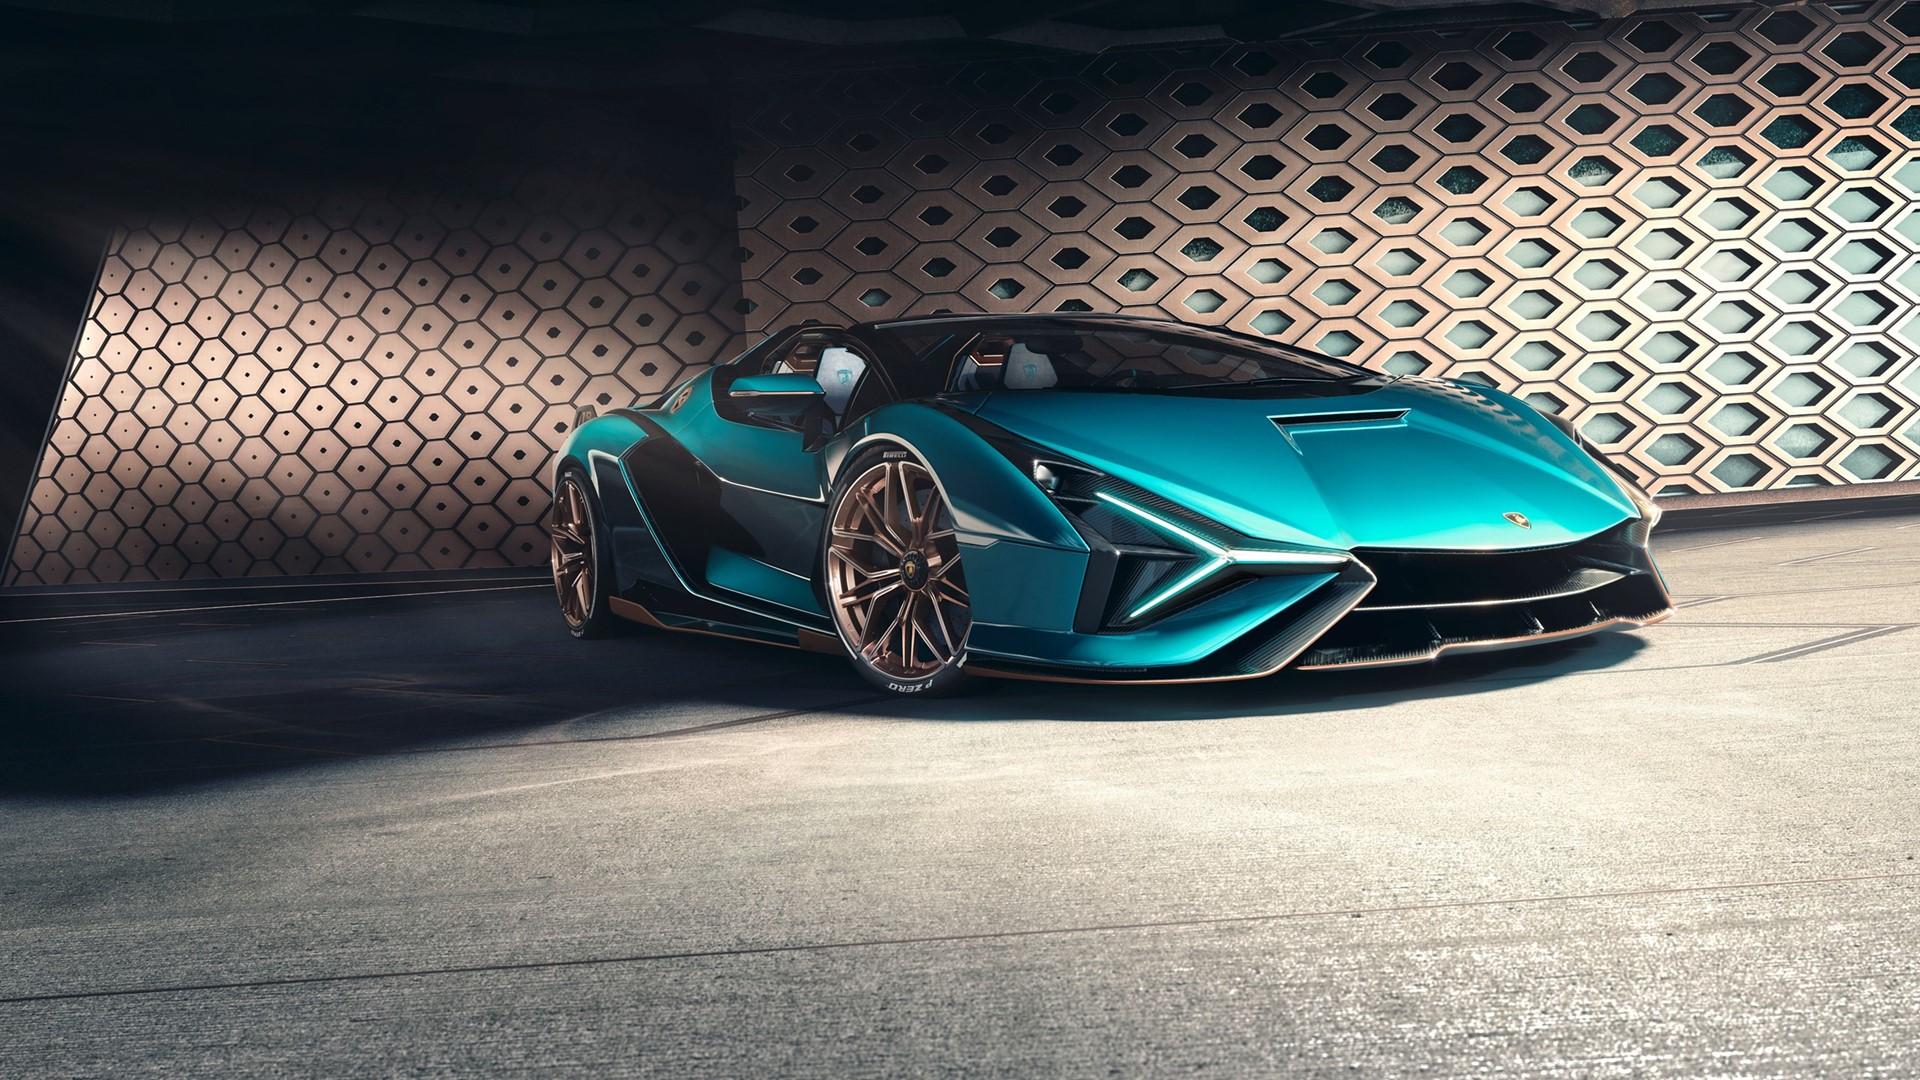 A record September for Automobili Lamborghini - Image 3